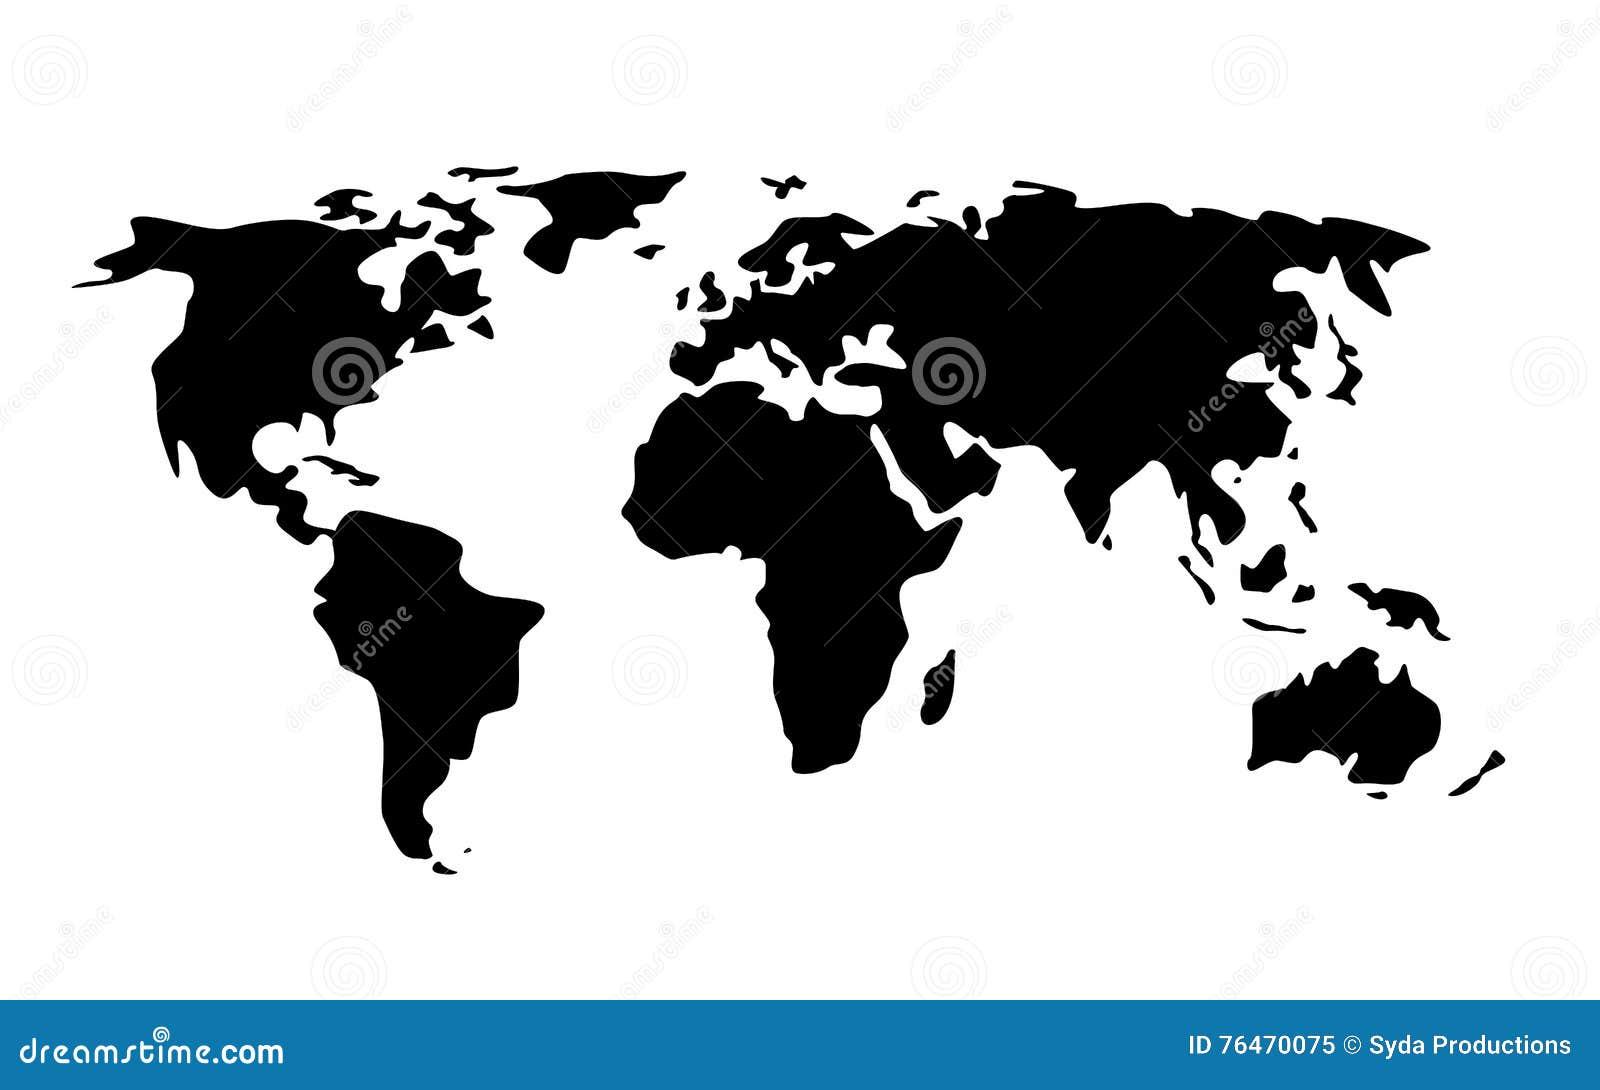 Black world map illustration stock illustration illustration of black world map illustration stock illustration illustration of location asia 76470075 gumiabroncs Gallery